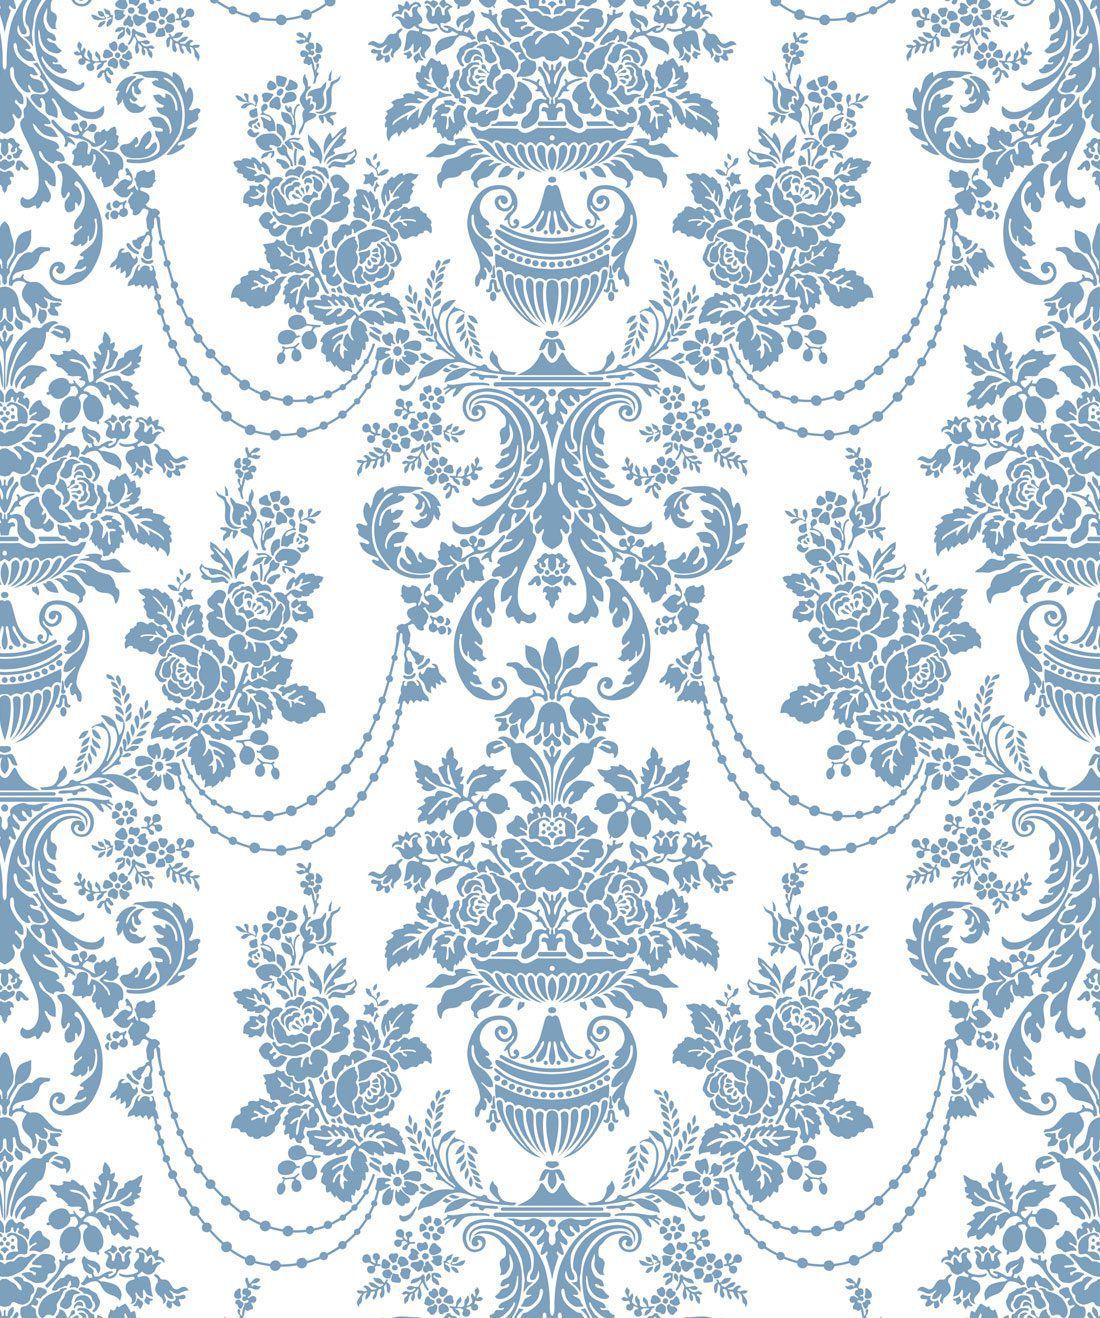 Imperial Wallpaper Dusk Blue